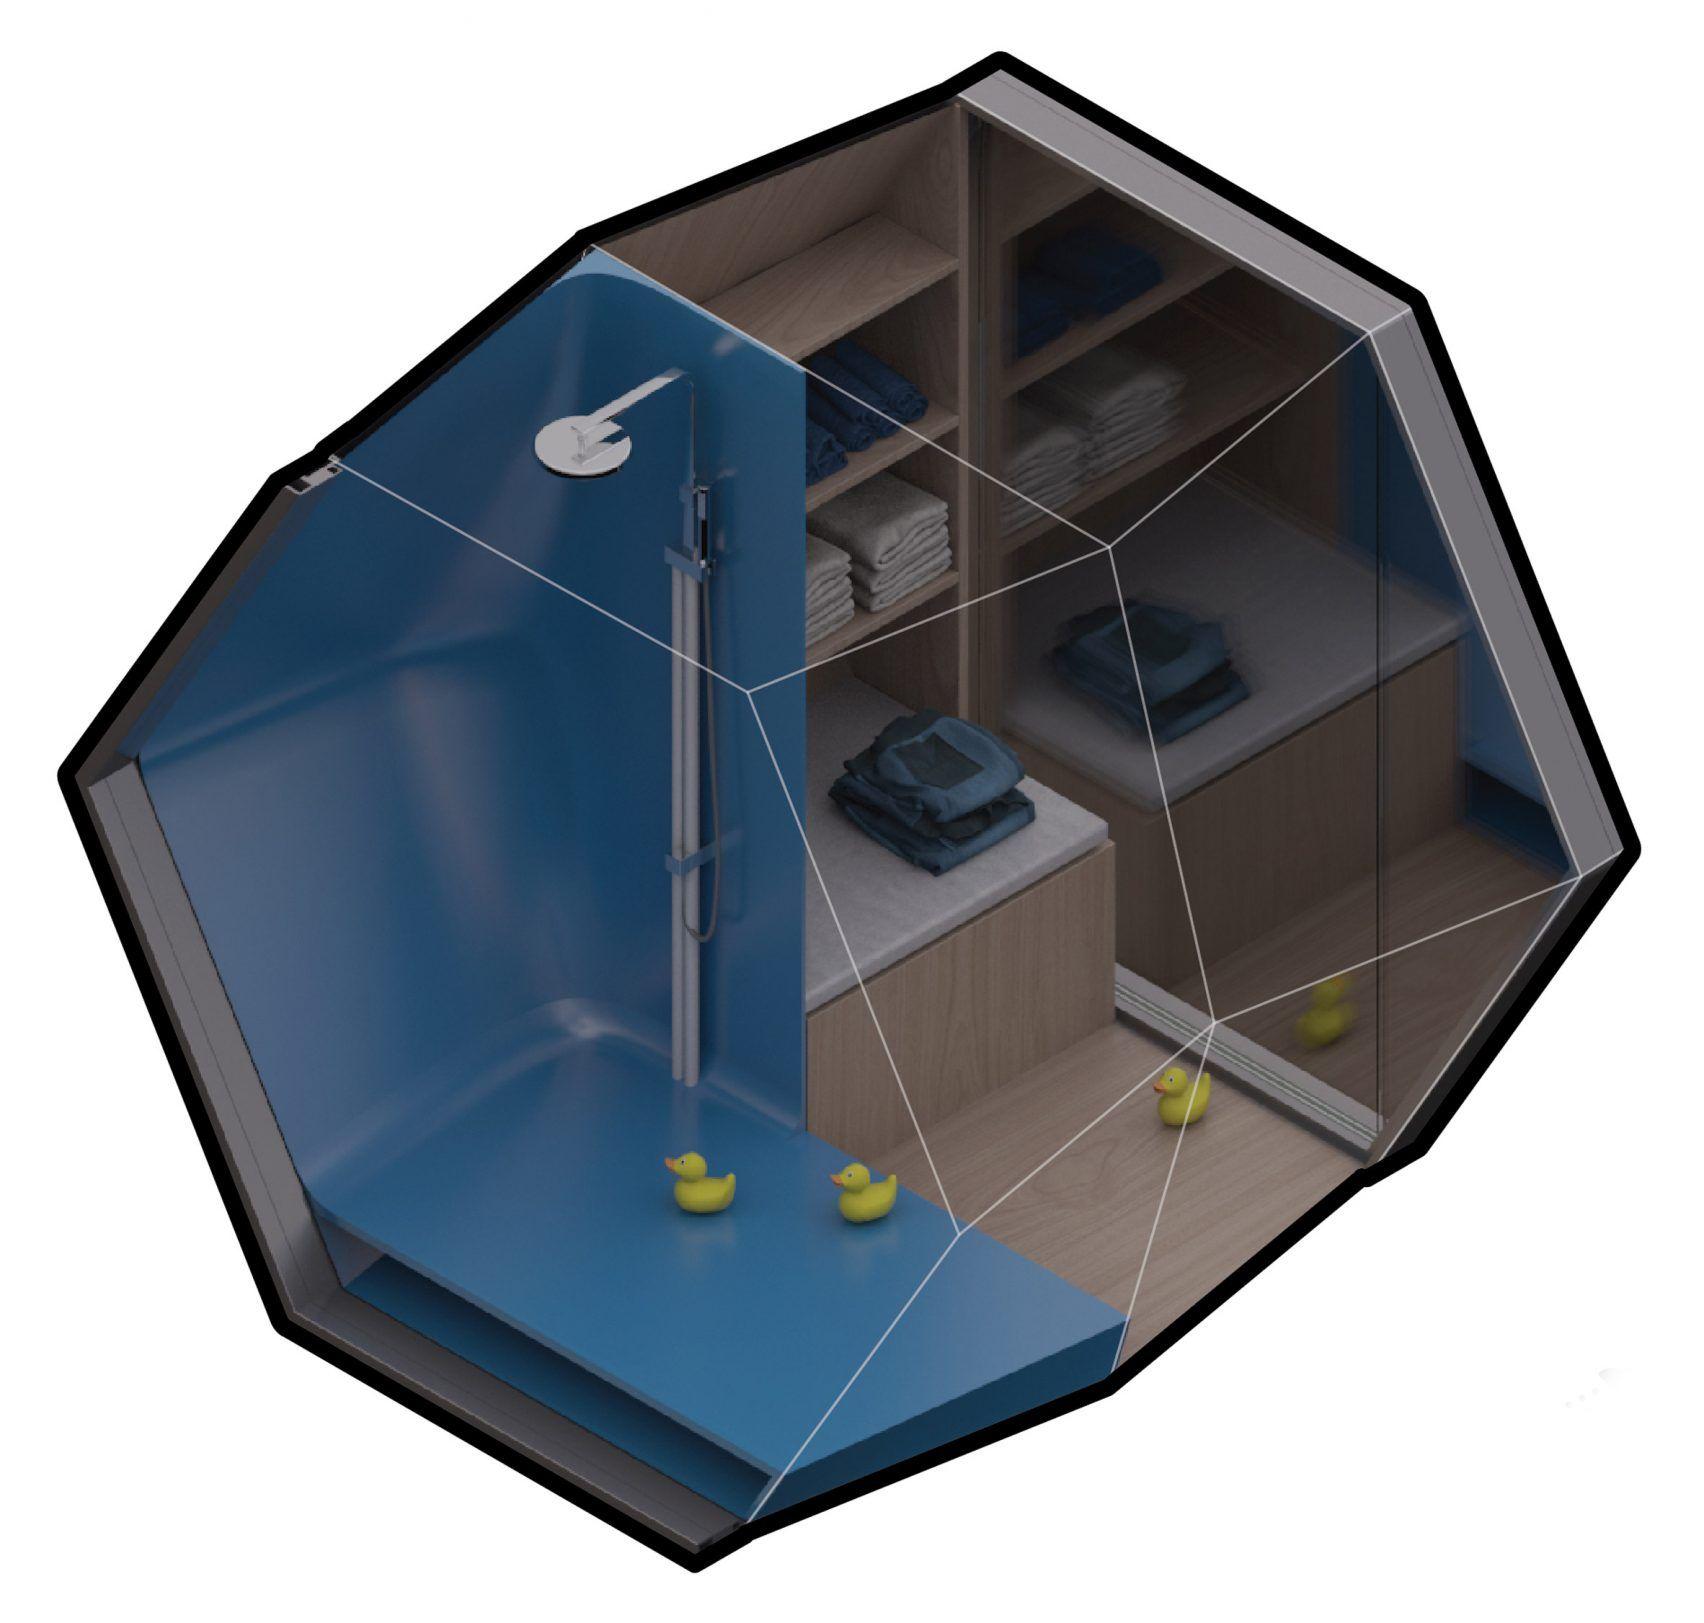 Framlab Proposes Parasitic Hexagonal Pods To Sleep New York S Homeless Homeless Shelter Design Shelter Design Homeless Housing